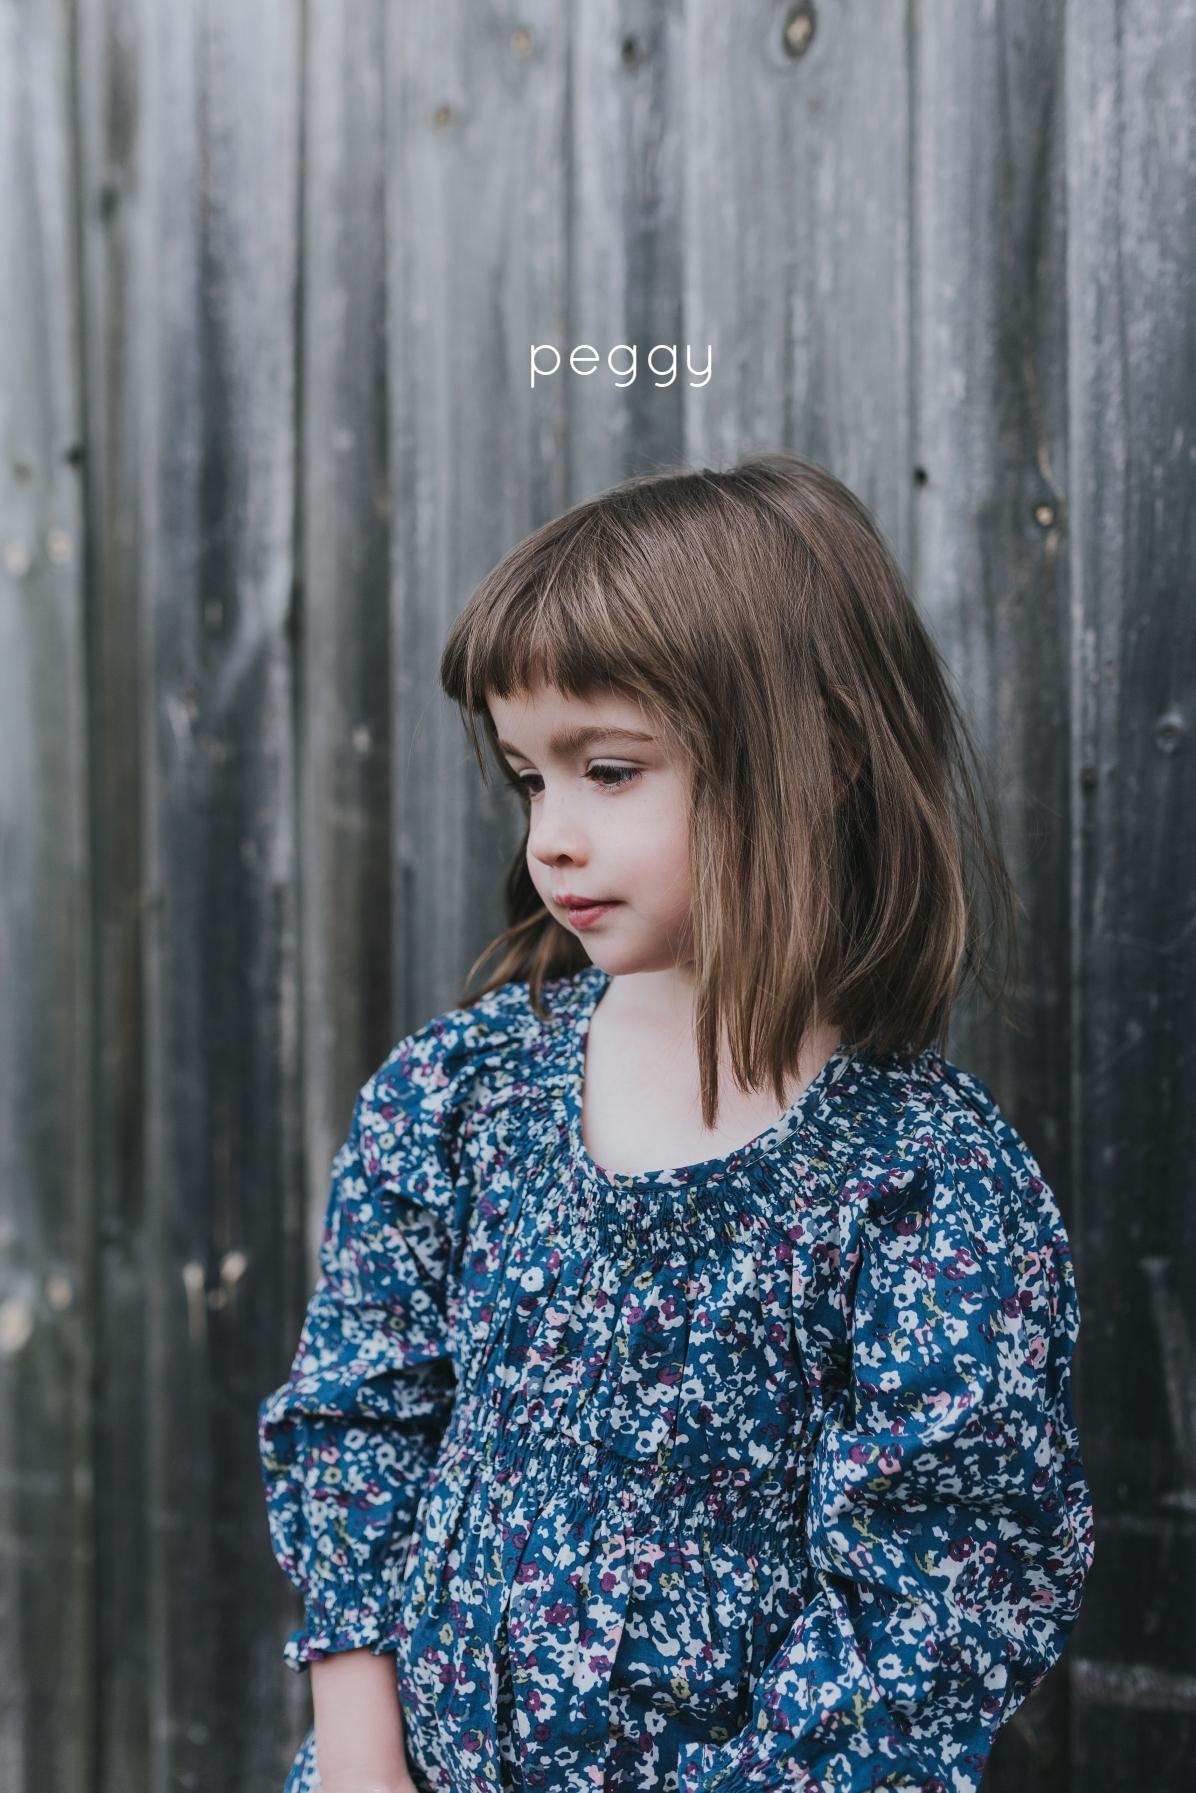 girl-kids-fashion-photography-siida-hobart-peggy.jpg